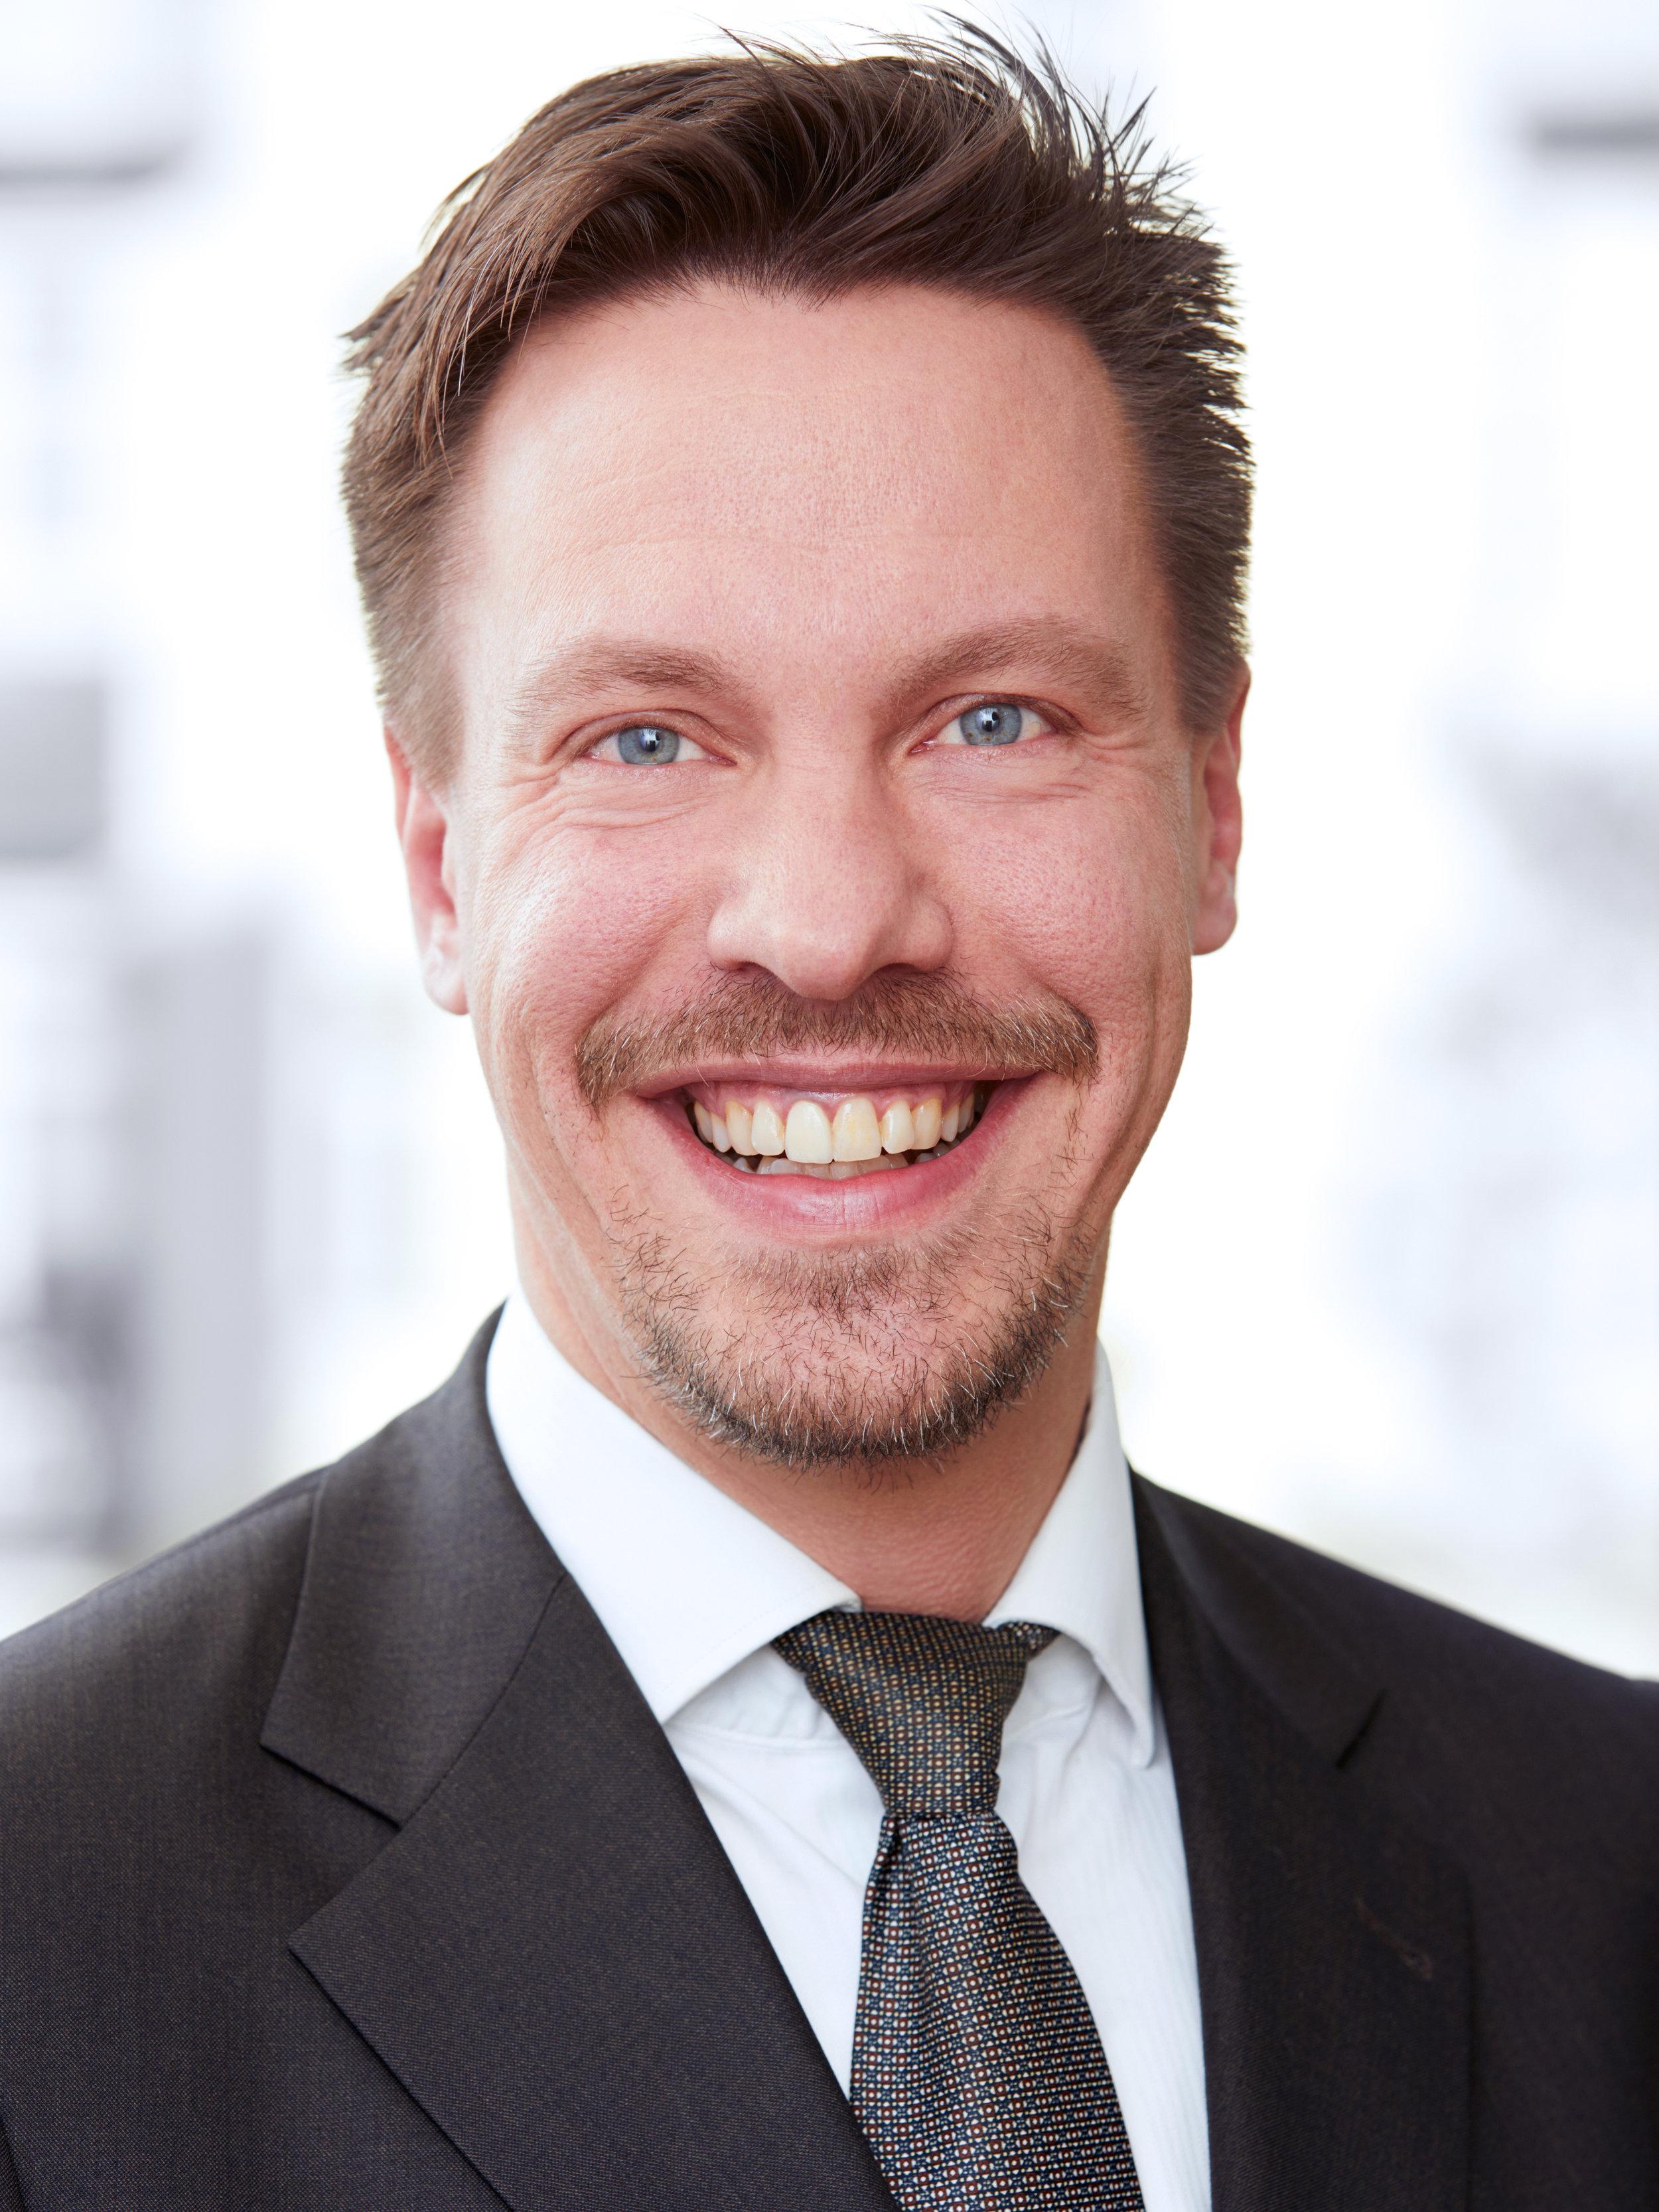 Markus Huber, Senior Manager, it-economics